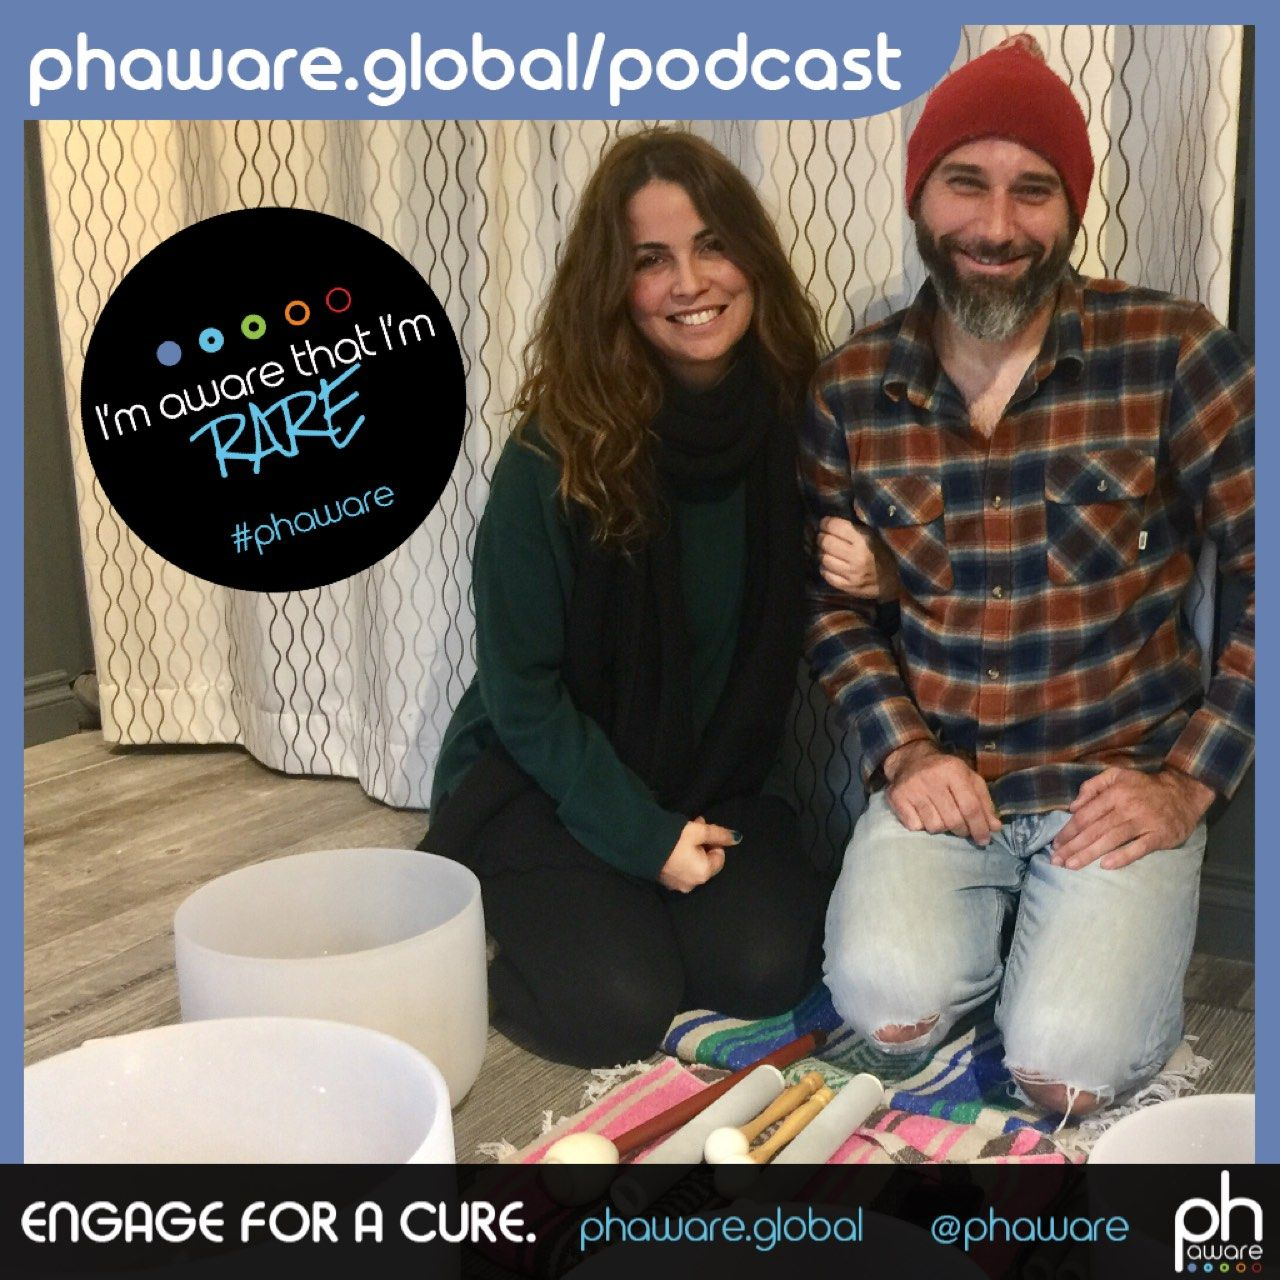 I'm Aware That I'm Rare: the phaware™ podcast: Sound Bath Guided Mediation Transcript